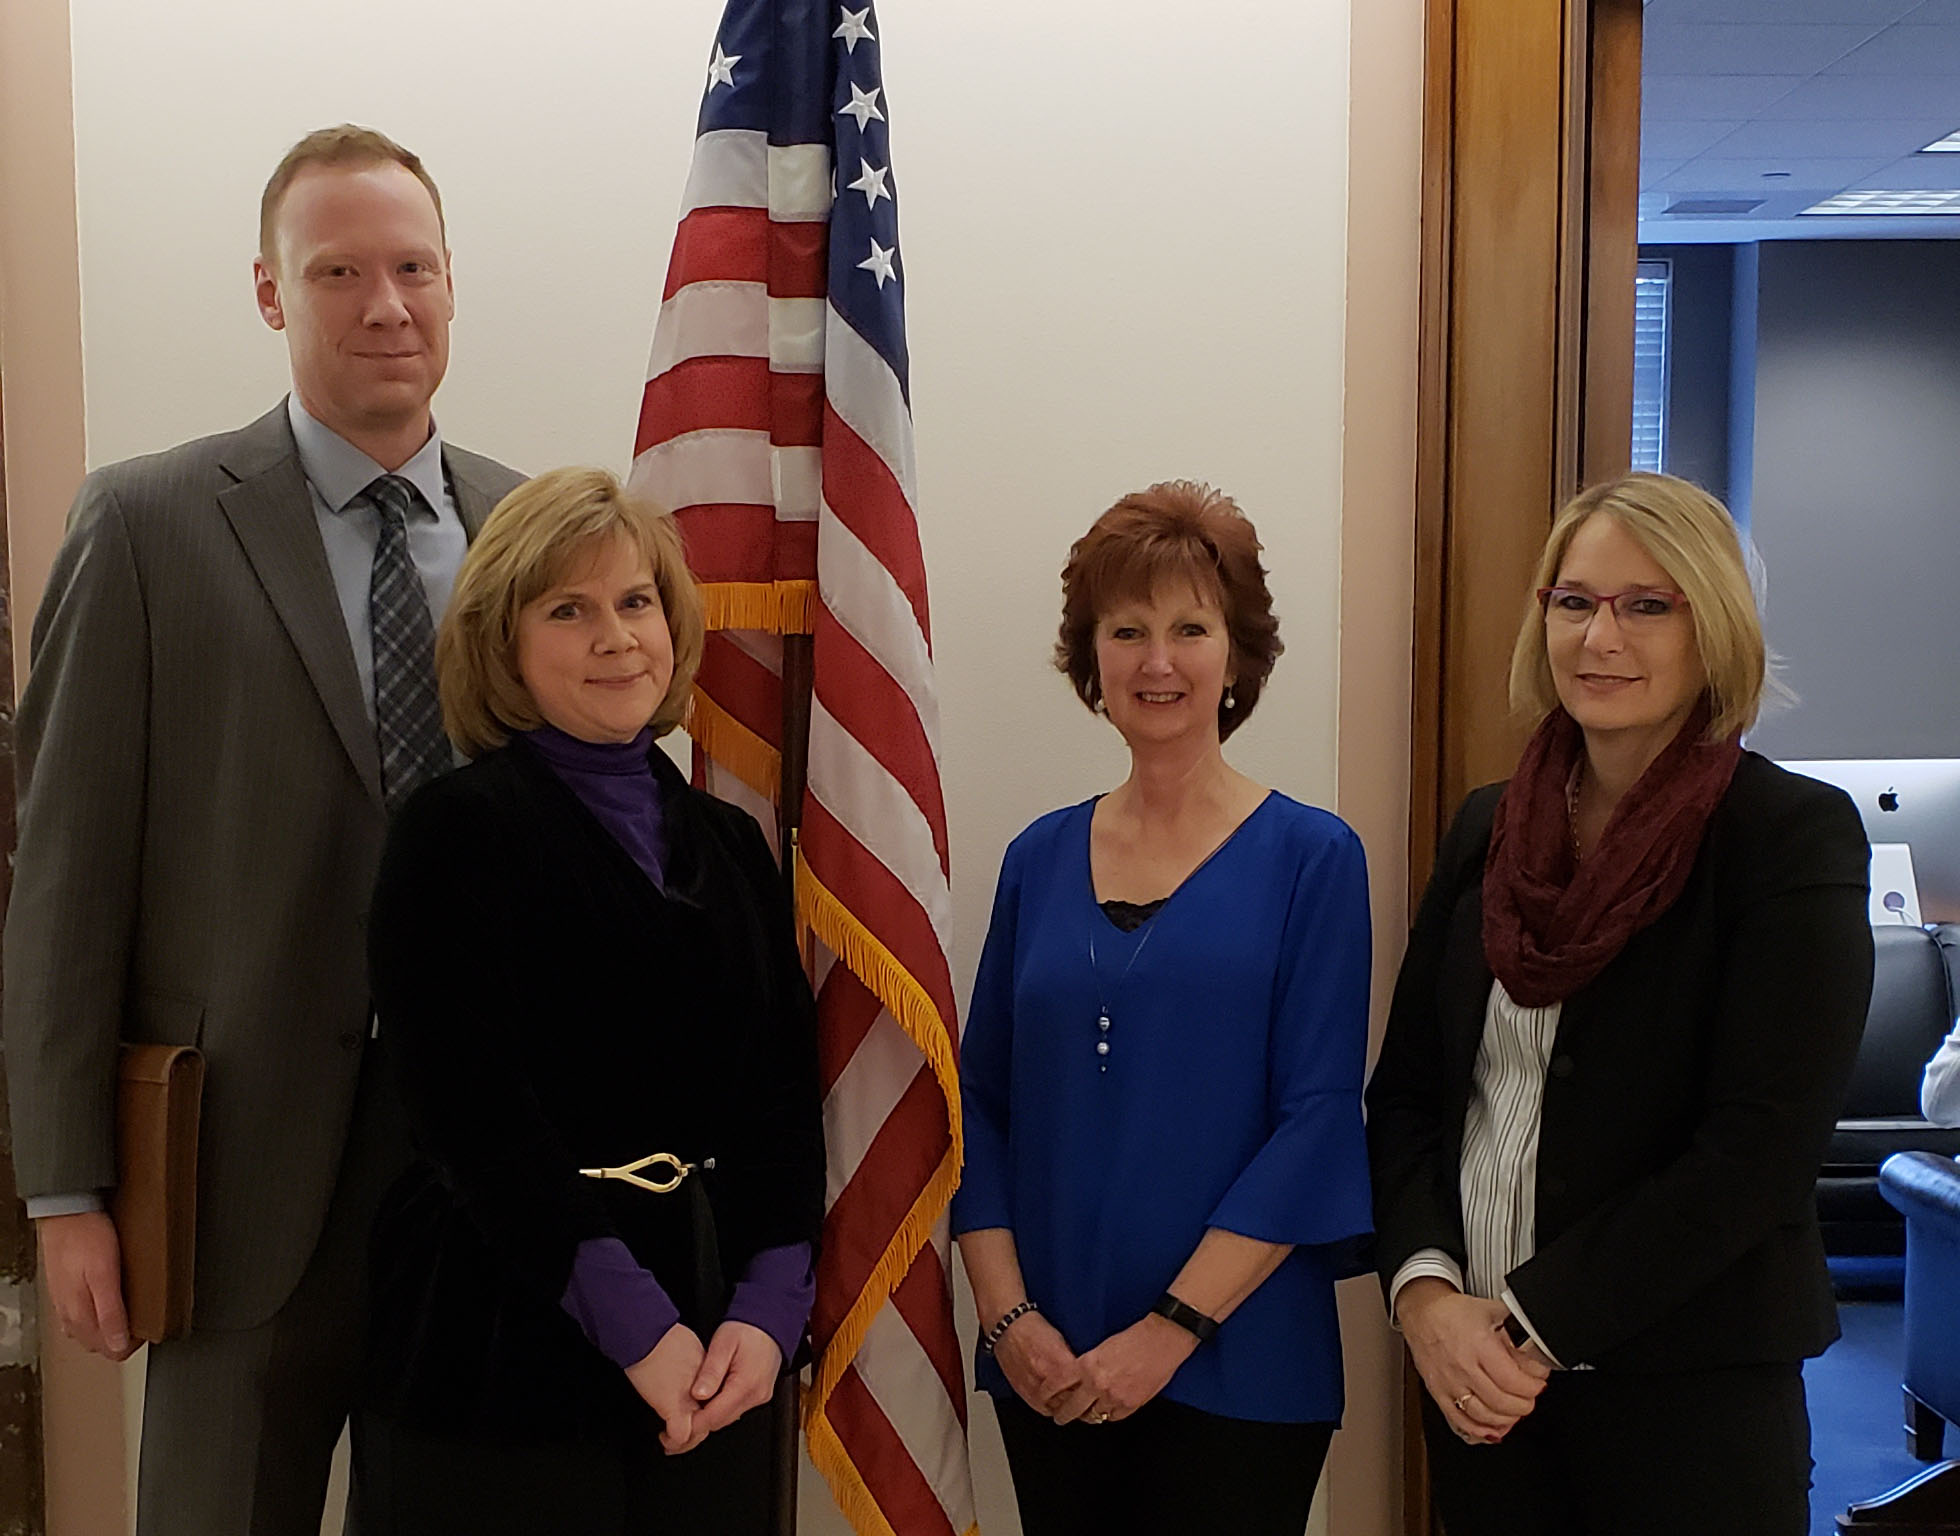 Alliance members Brad Olm (Gordon Flesch Co.), Wendy Culver (Mead & Hunt), Vikki Brueggeman (Zimbrick), Annette Mikula (Rock County) at the U.S. Senate (Nov. 28, 2018)